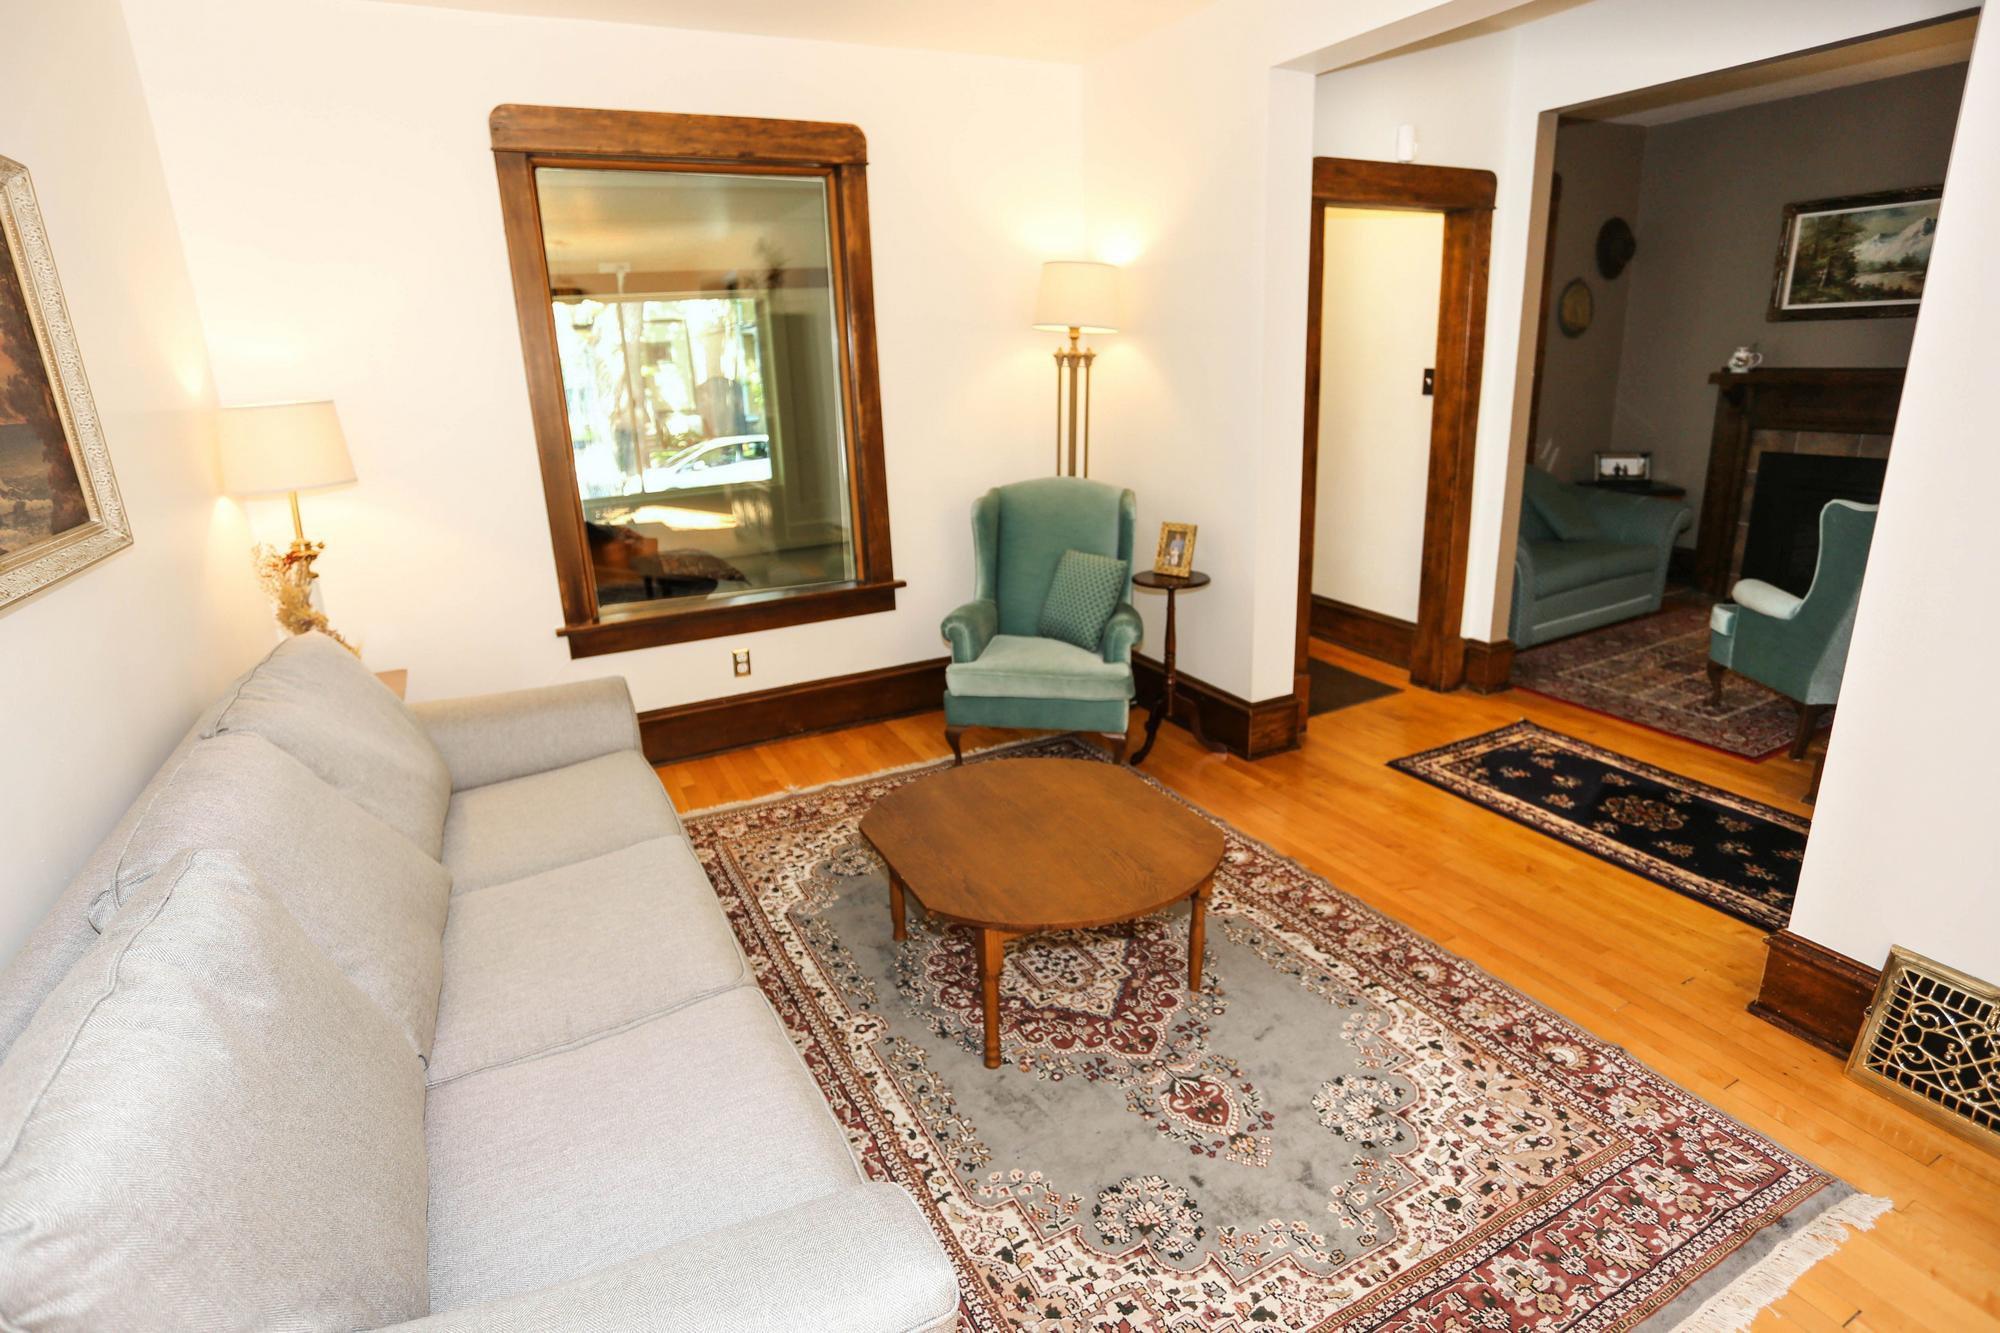 Photo 6: Photos: 105 Evanson Street in Winnipeg: Wolseley Single Family Detached for sale (5B)  : MLS®# 1821900